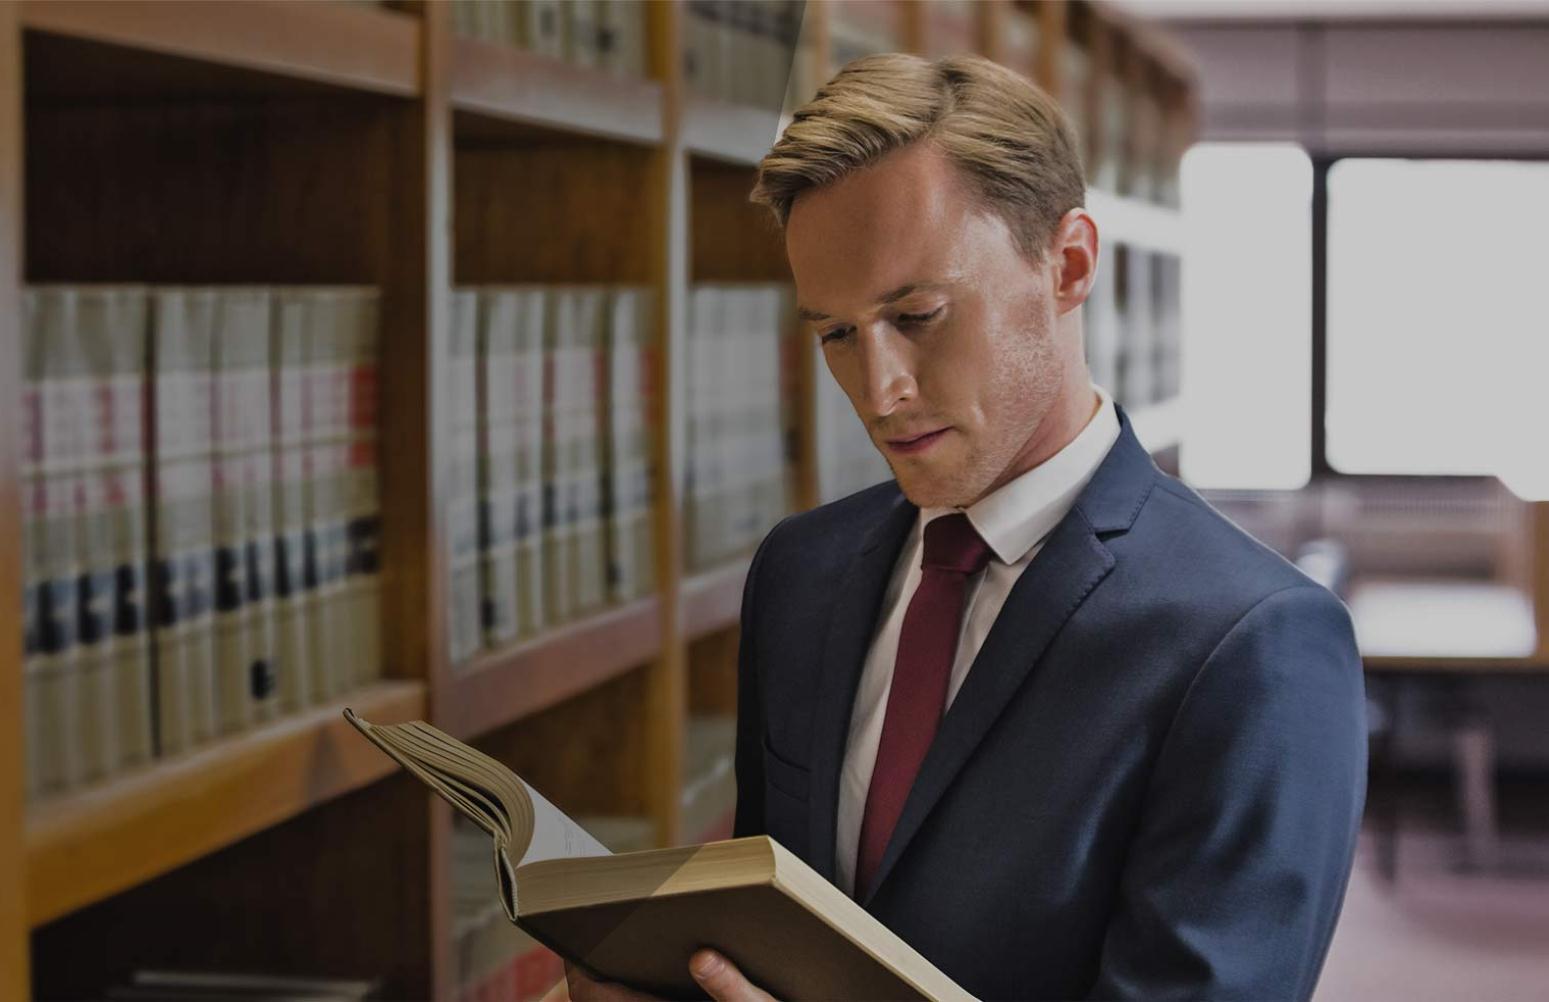 От юриста часто зависит жизнь других